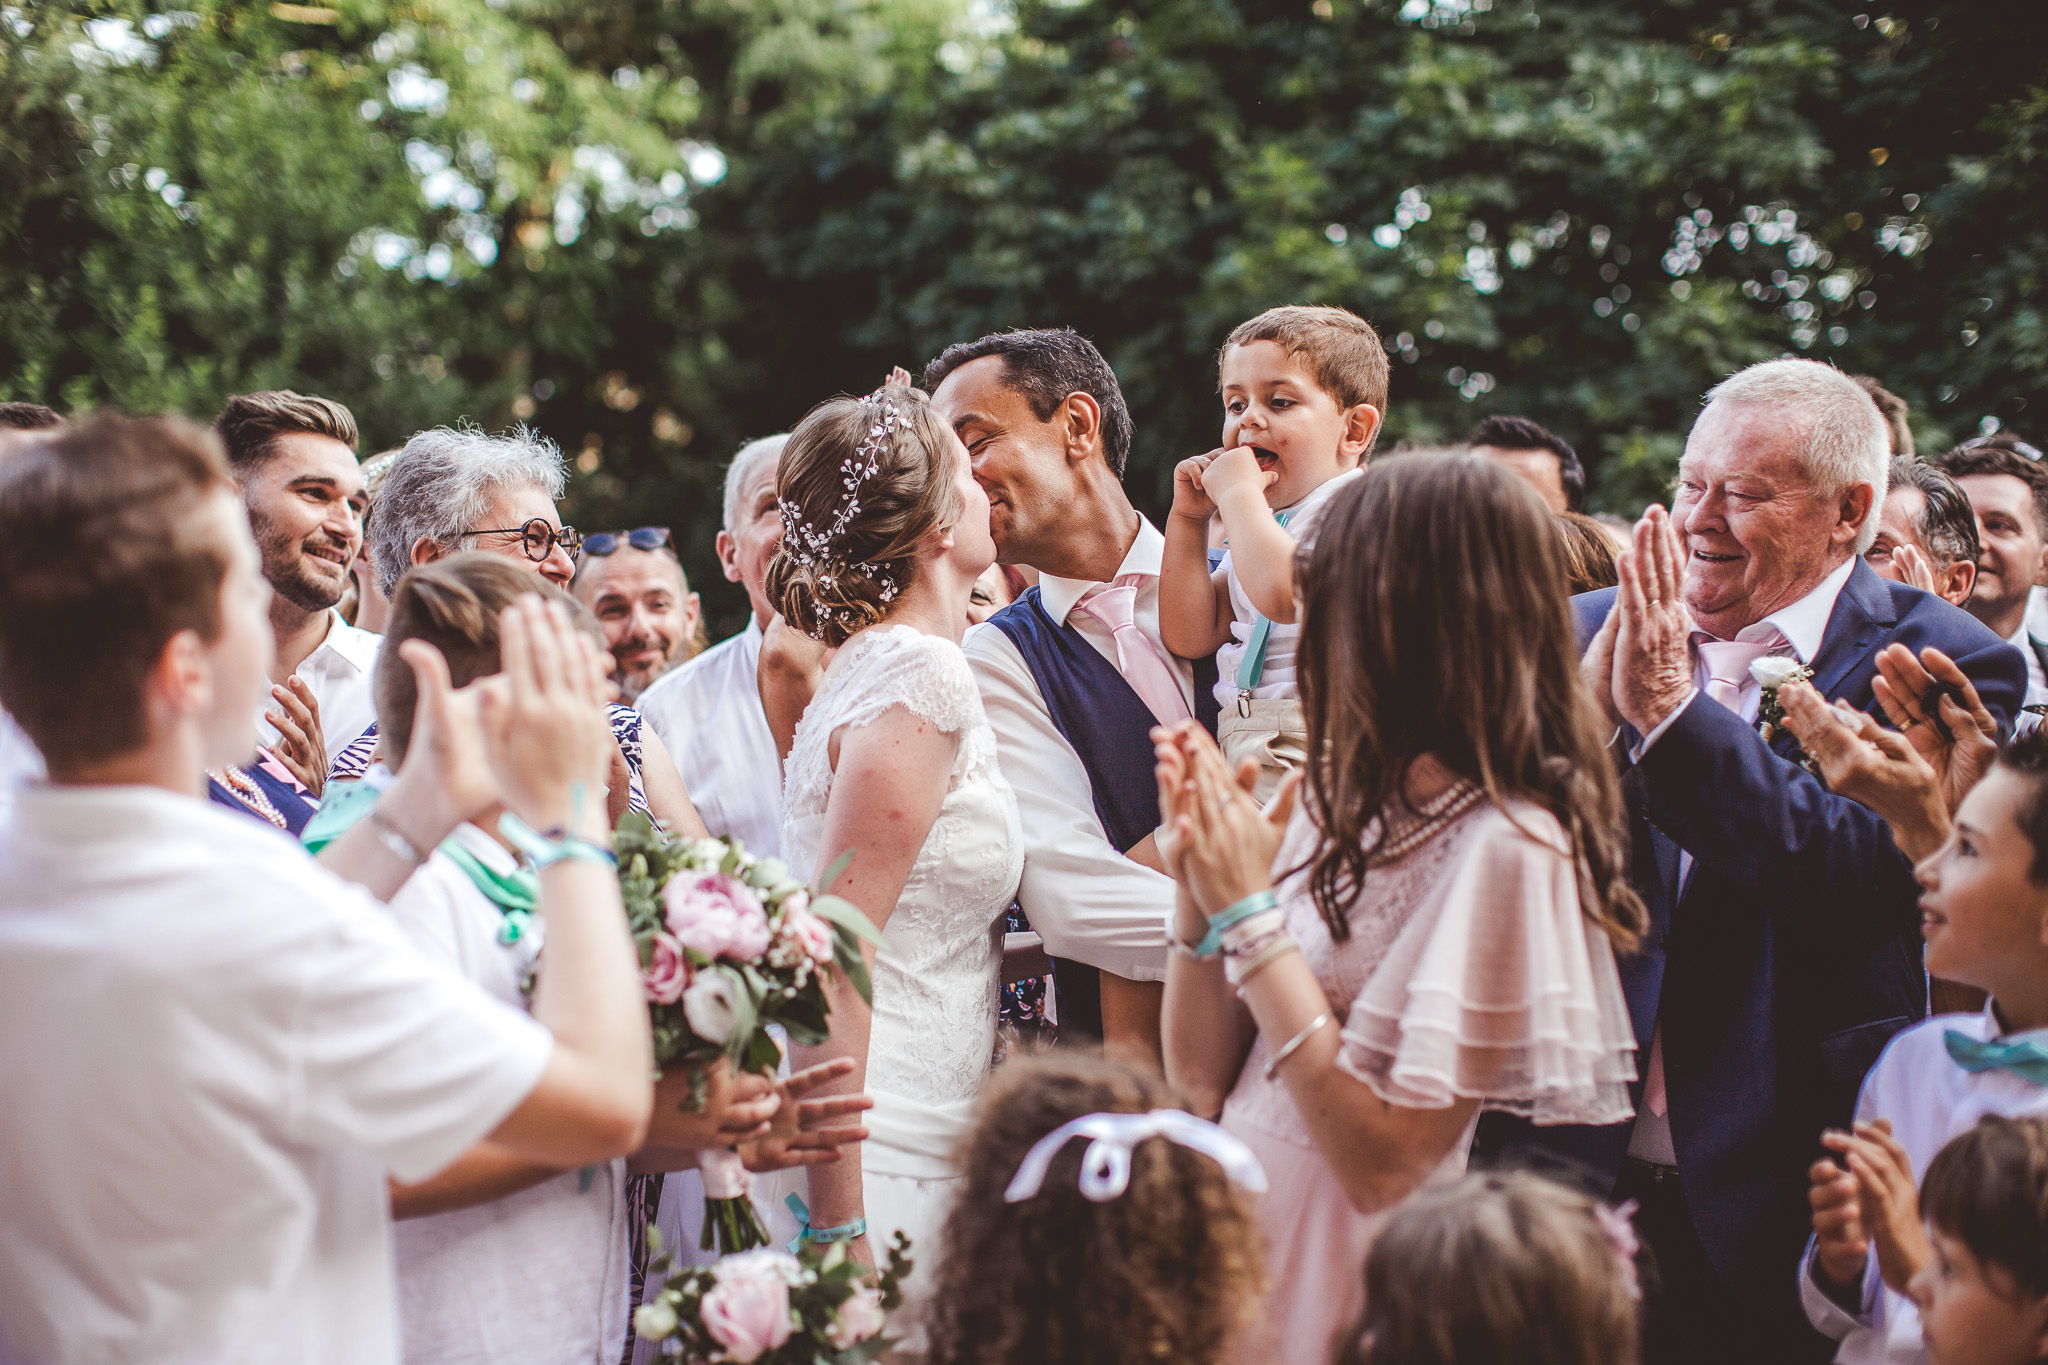 reportage mariage photo goupe orignale rigolo maries couple invites temoins amis famille toulouse chateau launac